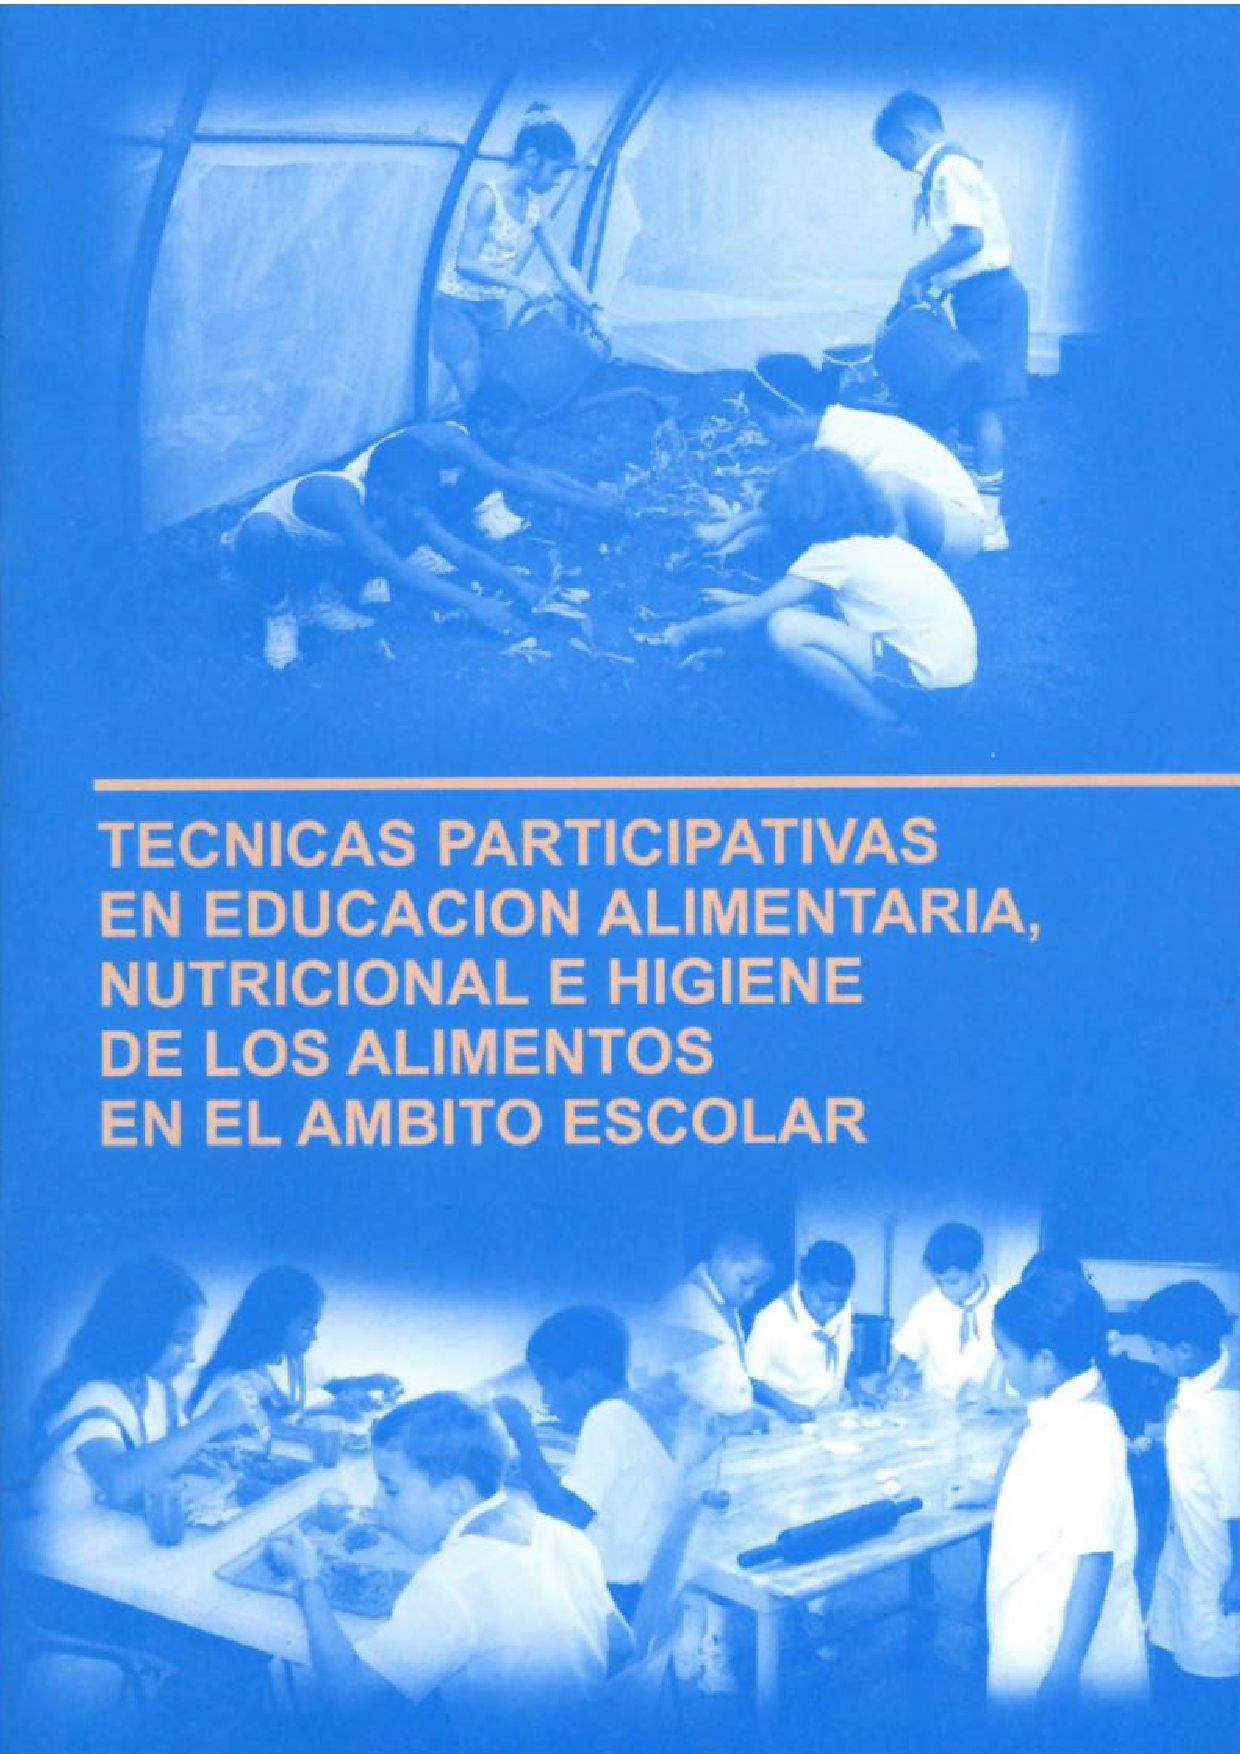 Técnicas participativas by Cuba Nutrinet.org - issuu